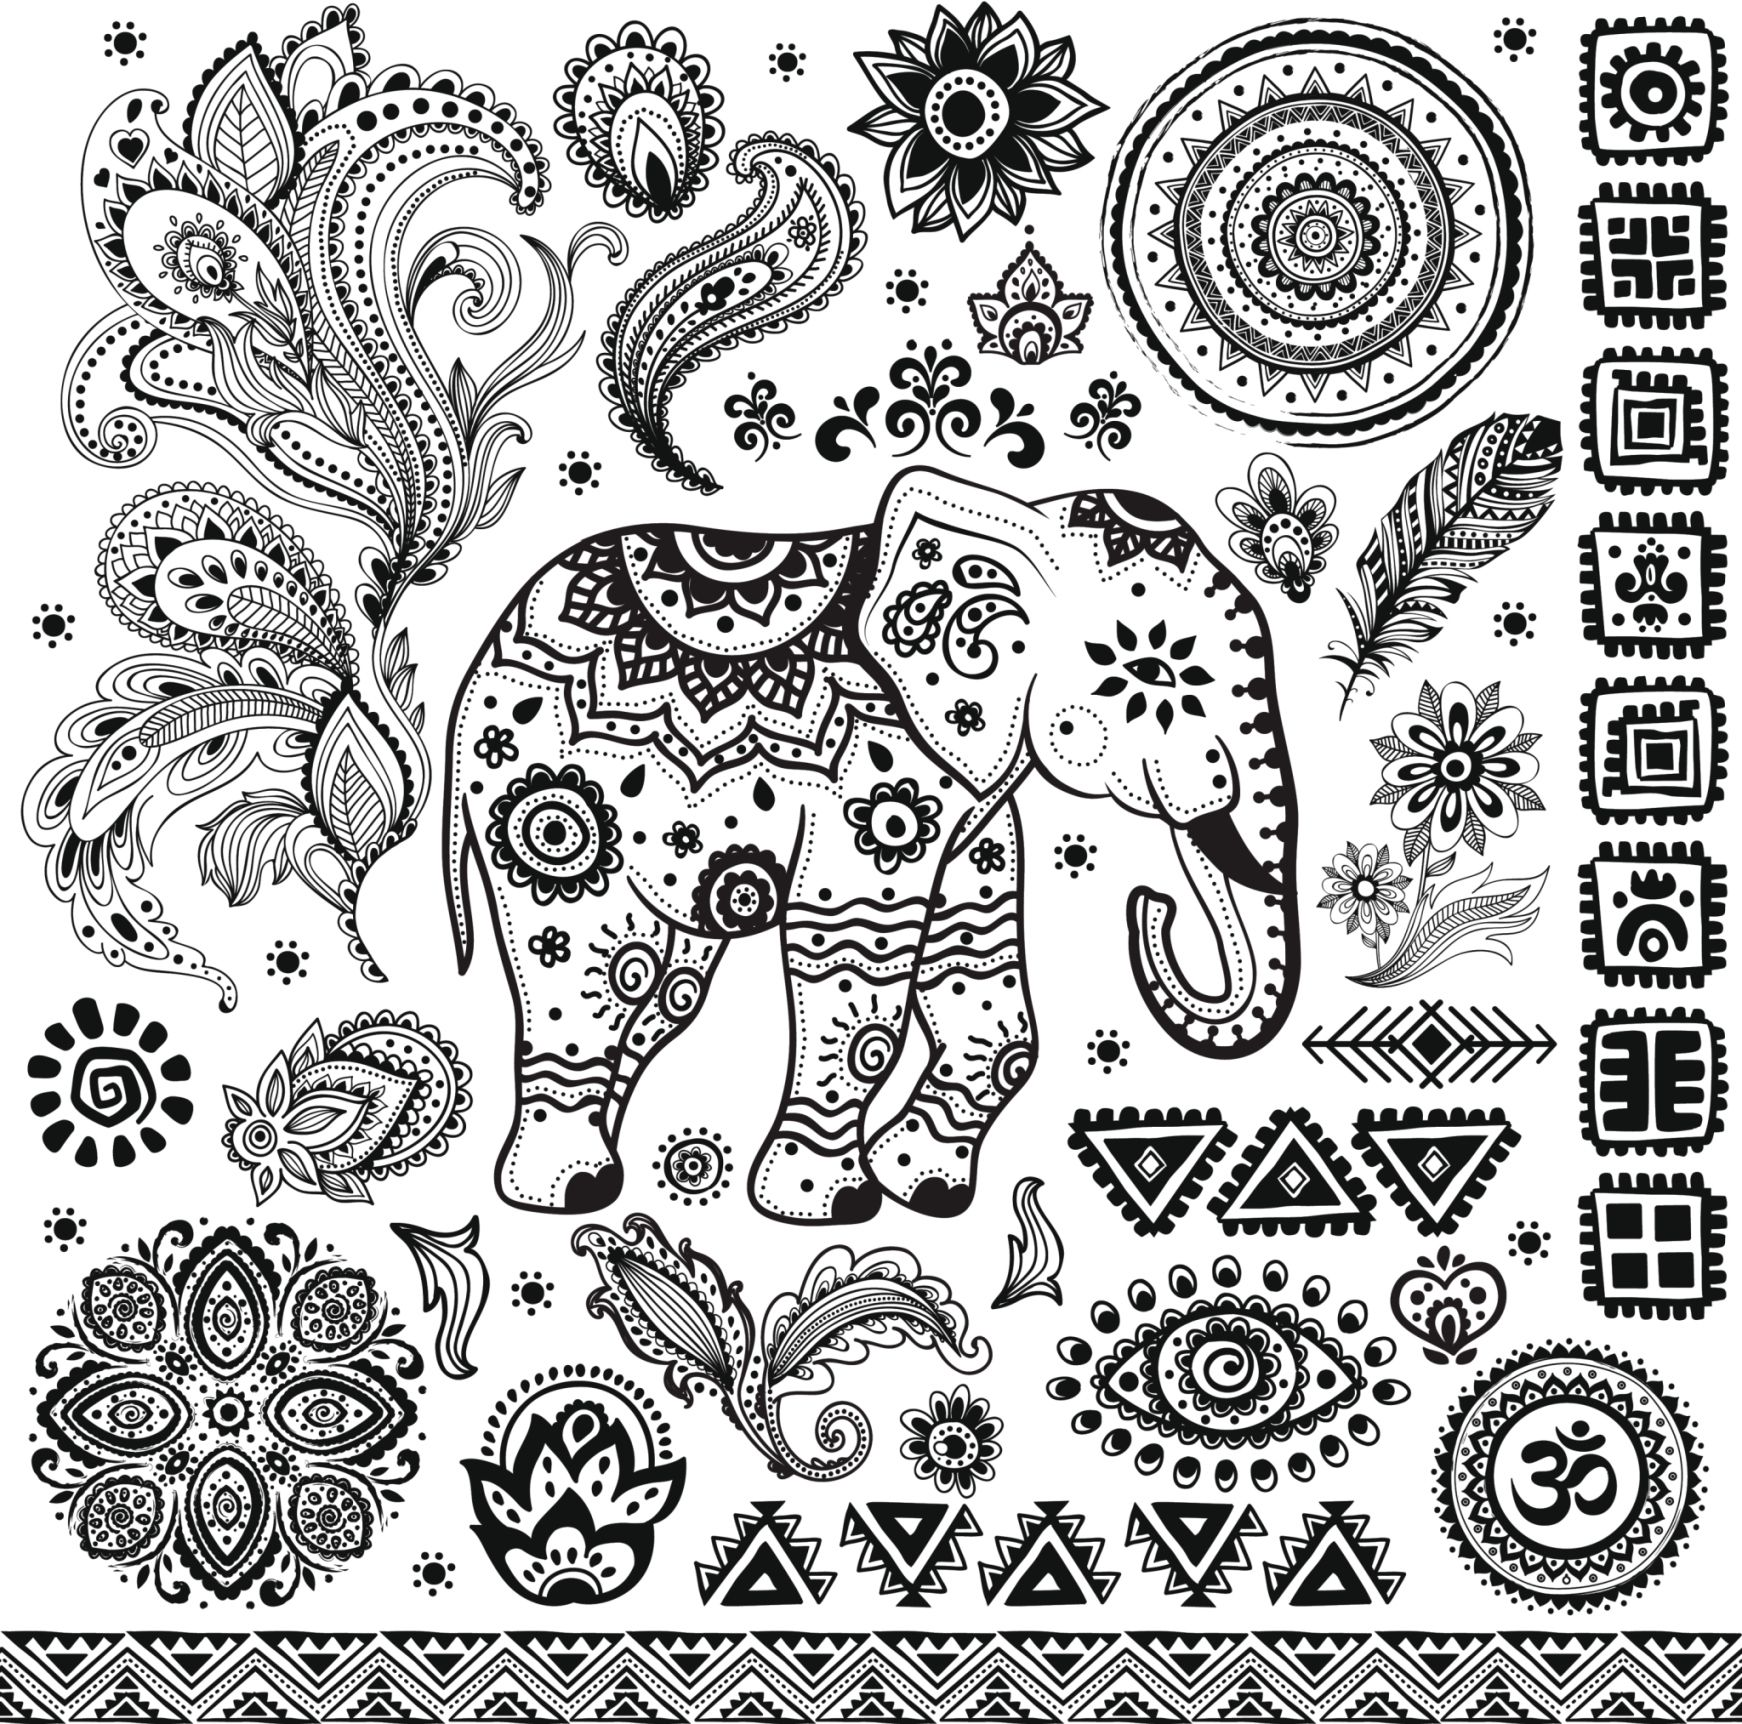 imagenes-de-mandalas-para-colorear-e-imprimir-dificiles-12.jpg (1742 ...